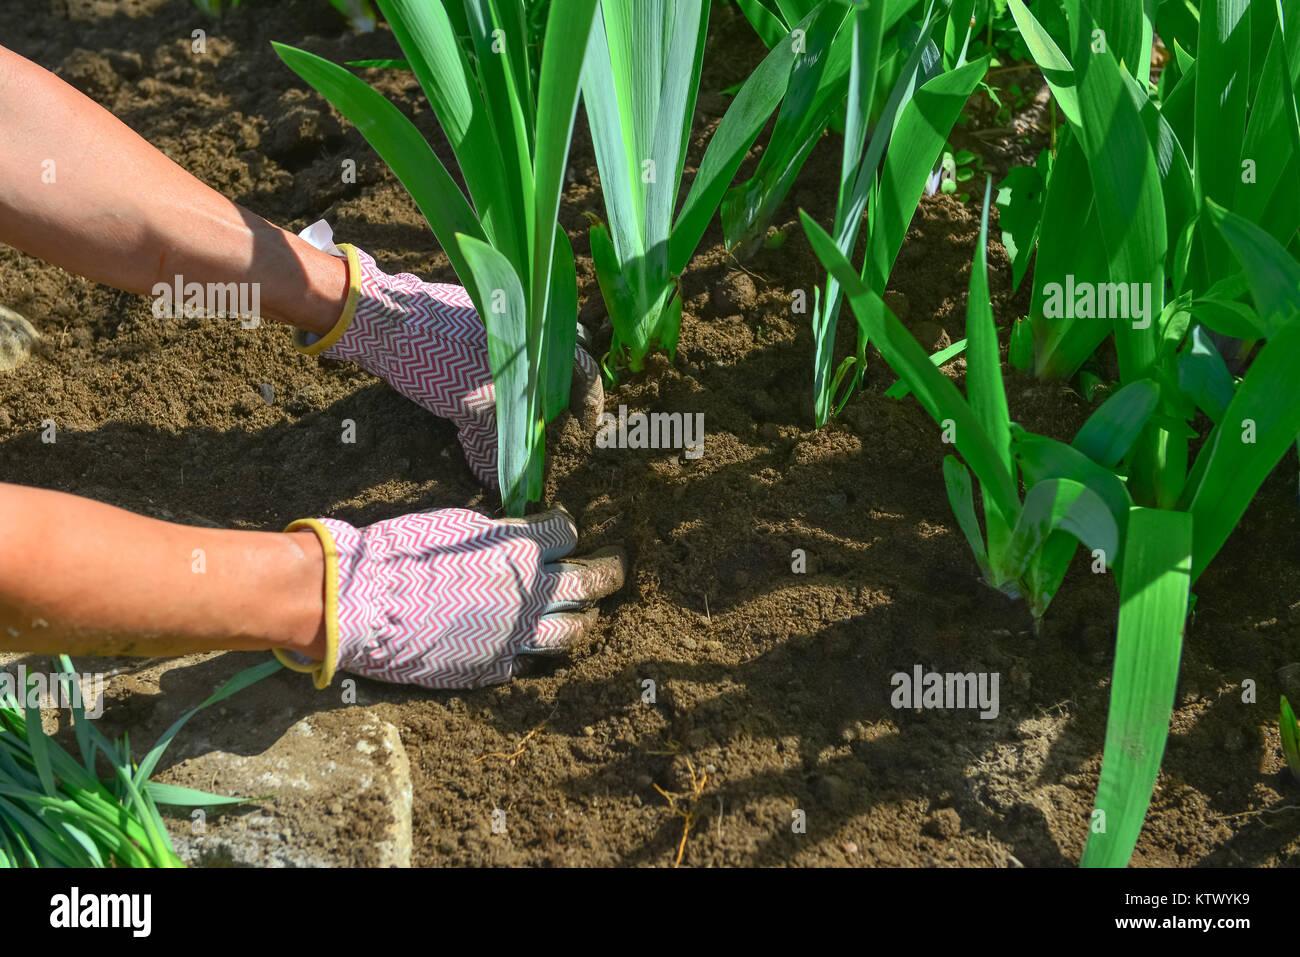 Transplanting Garden Stock Photos & Transplanting Garden Stock ...